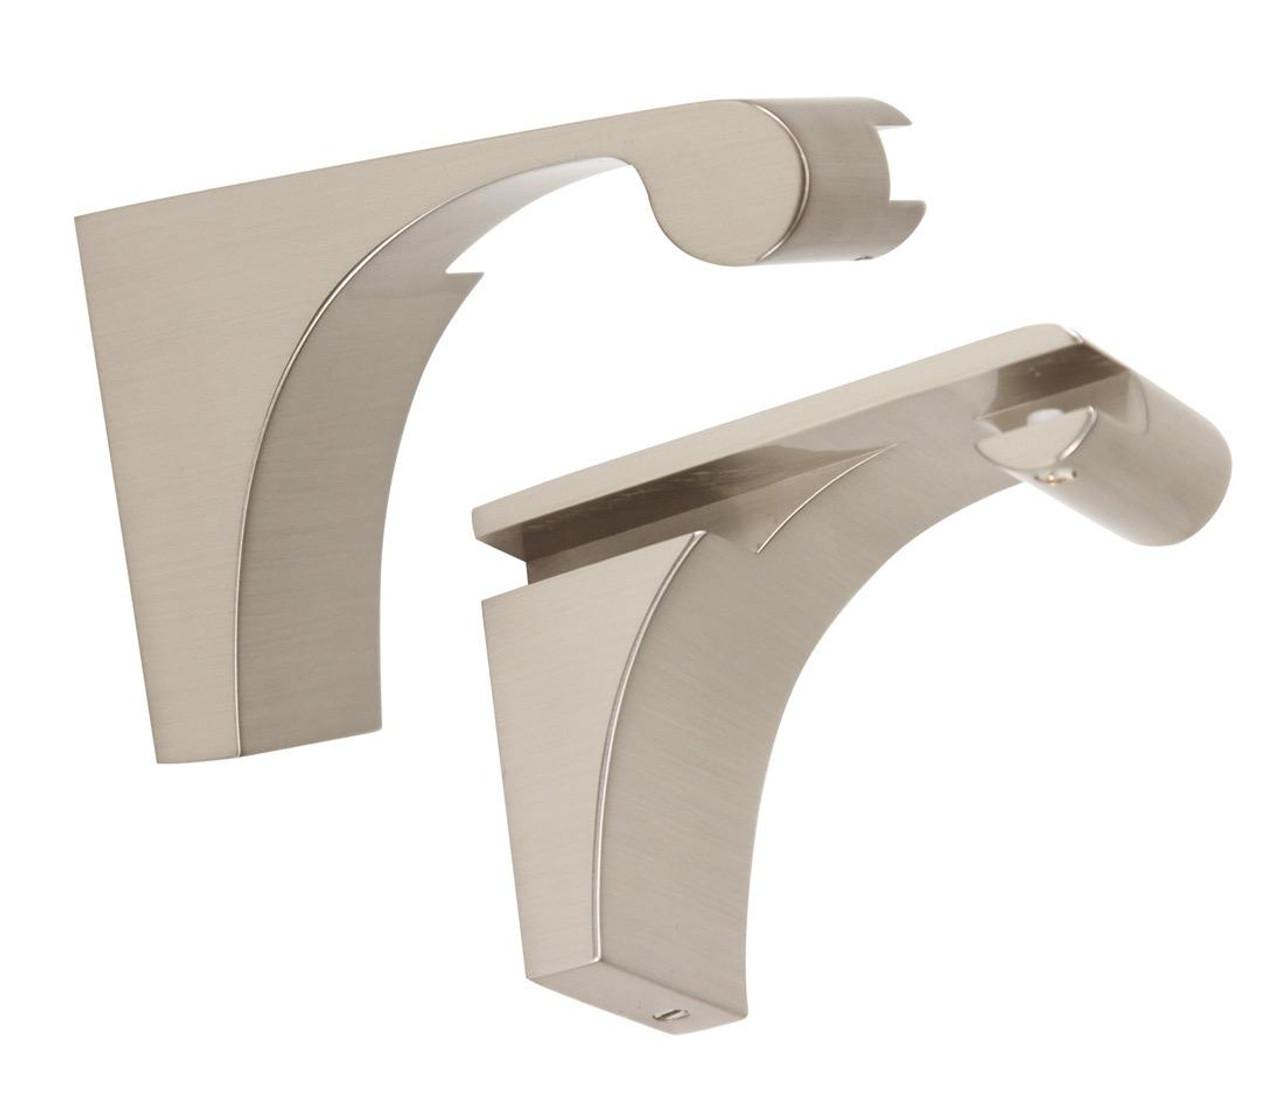 Shelf Brackets Only (Priced Per Pair) (ALNA6850-SN)